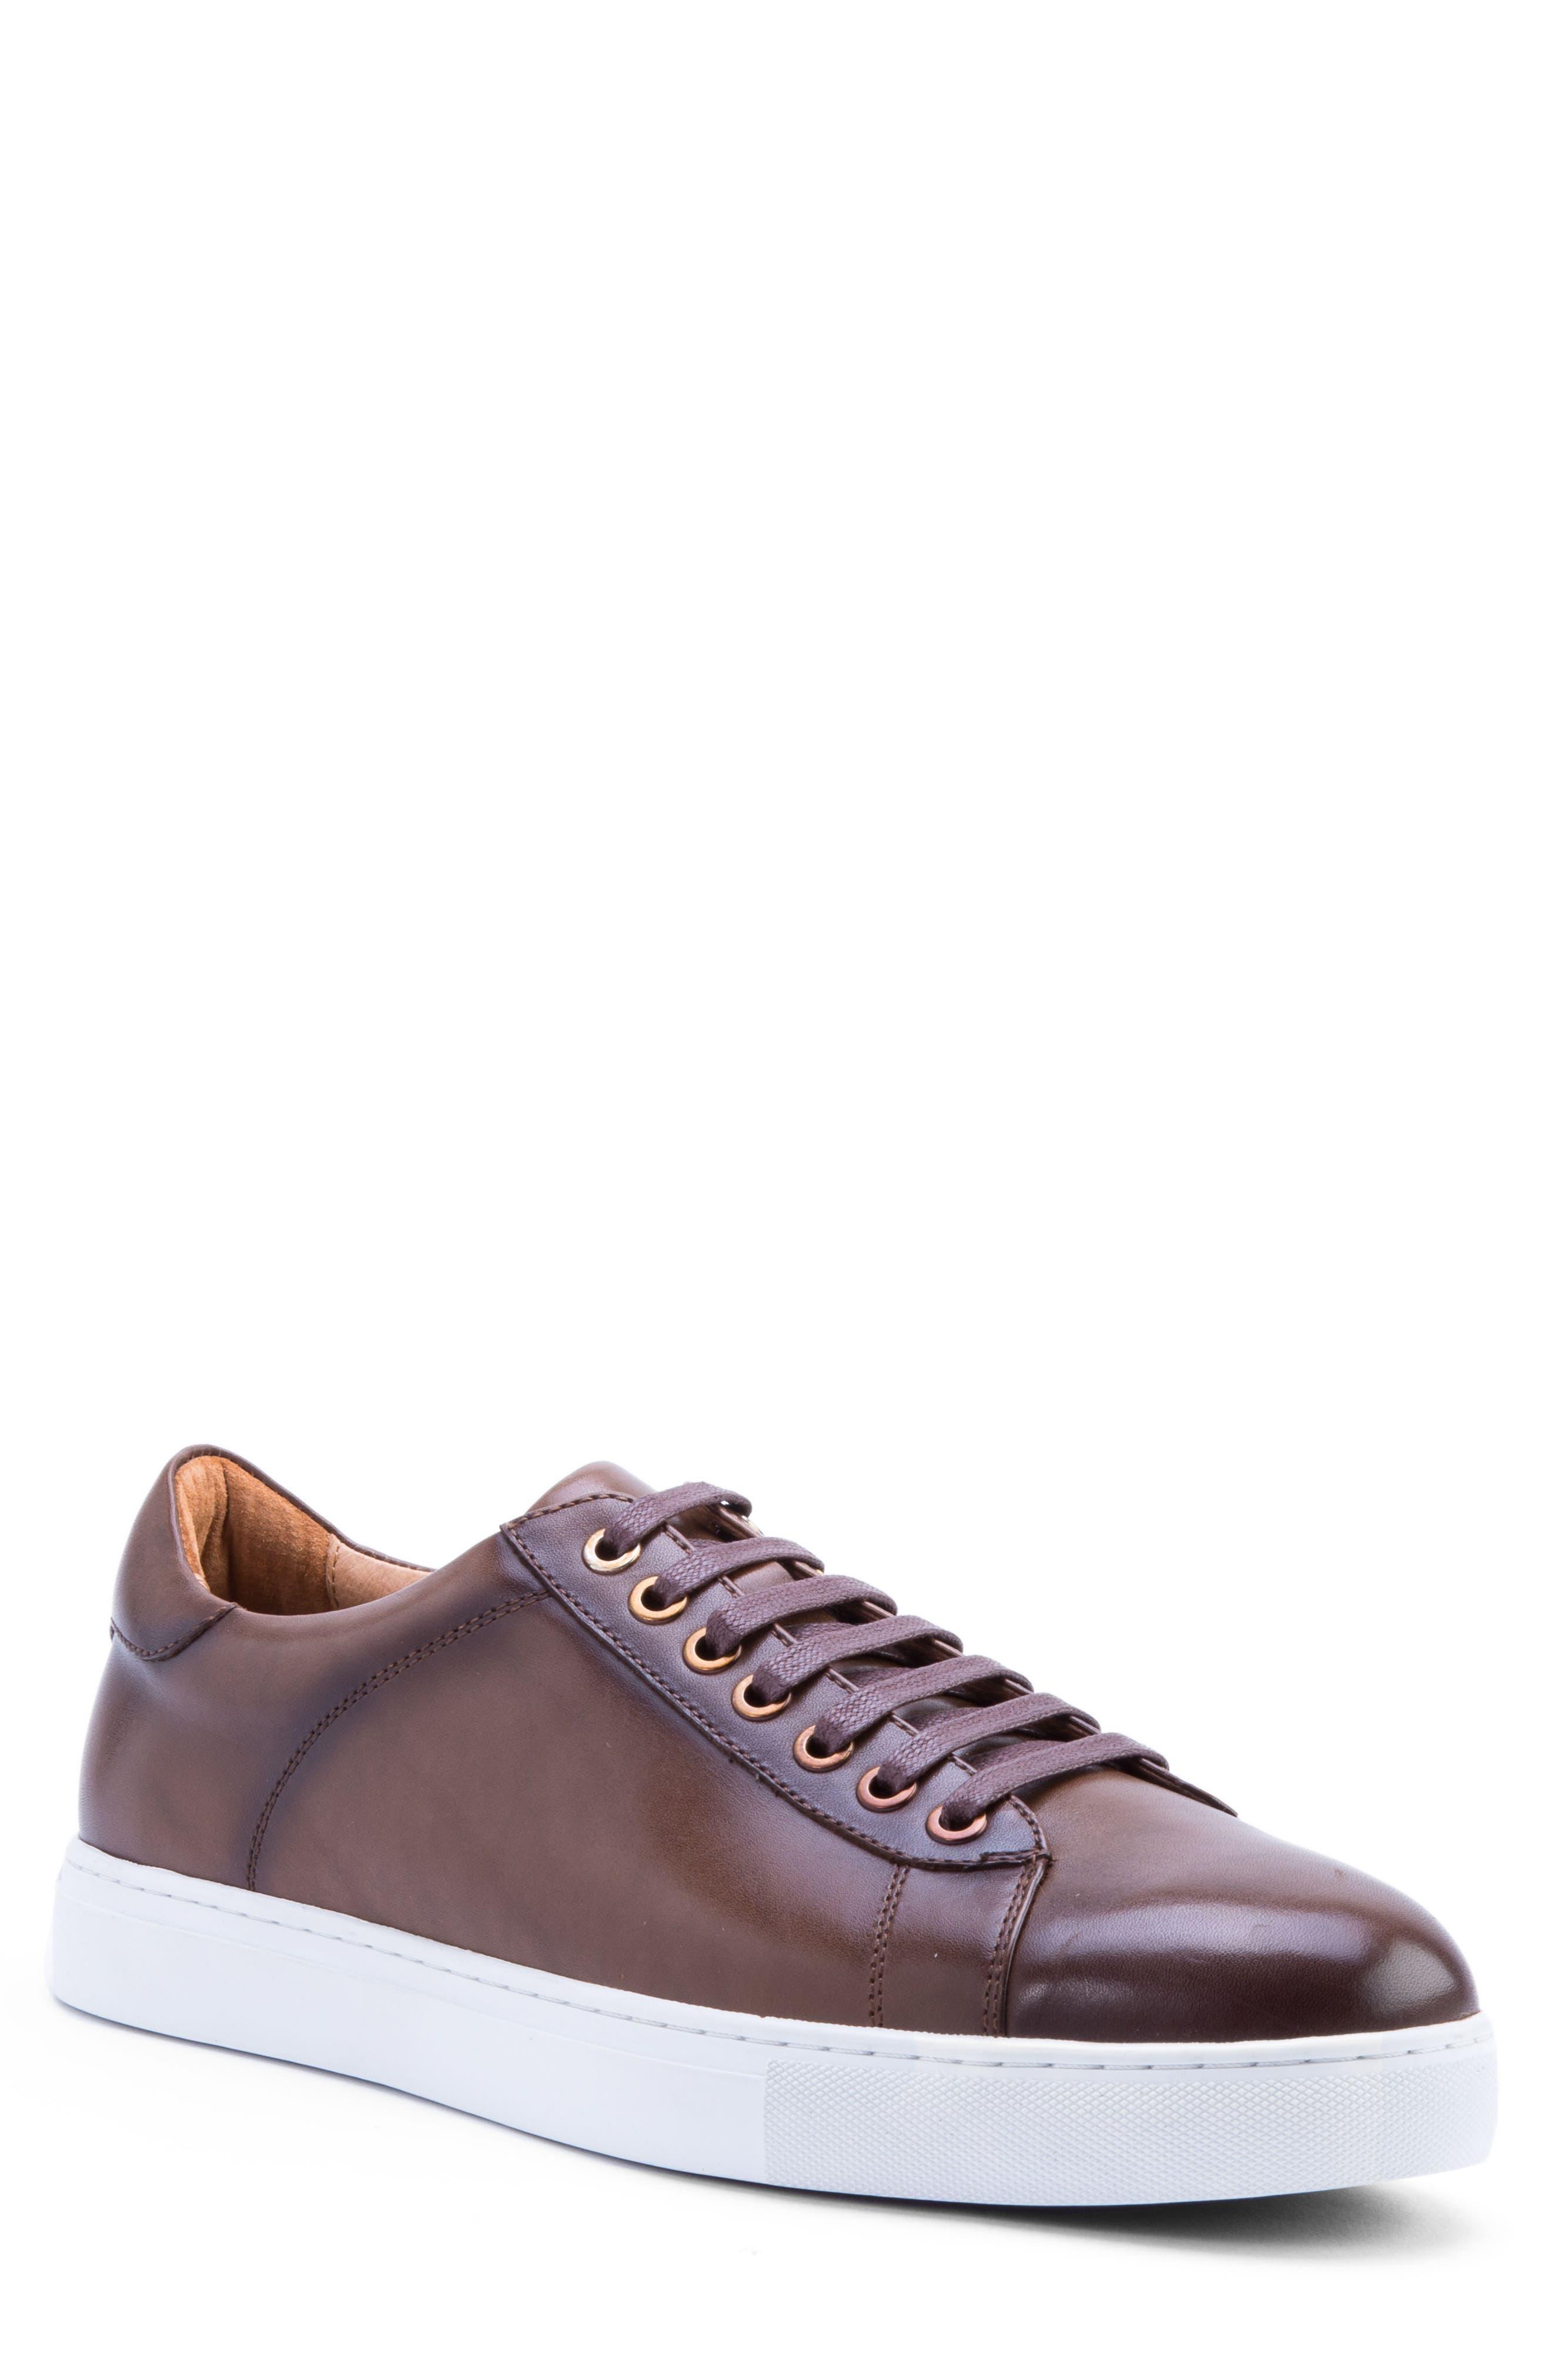 Zanzara Music Low Top Sneaker, Brown